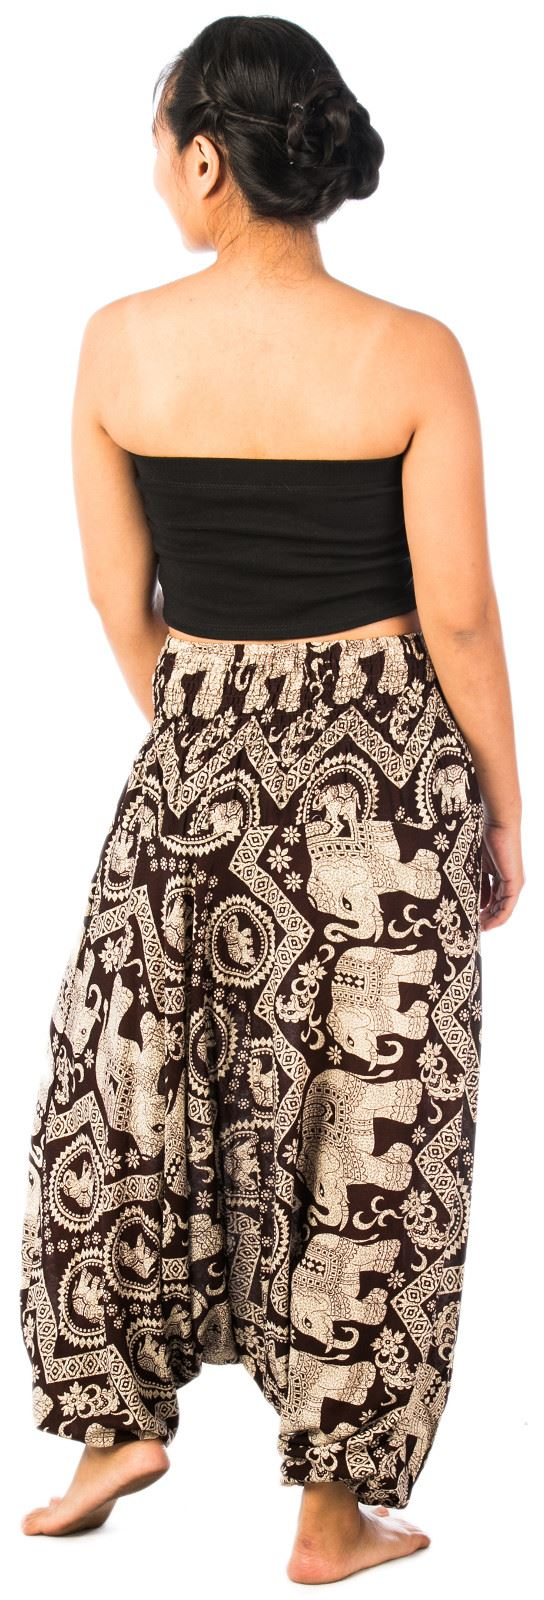 Gypsy Hippie Aladdin Genie Hammer Thai Elephant Women Harem Pants Trousers